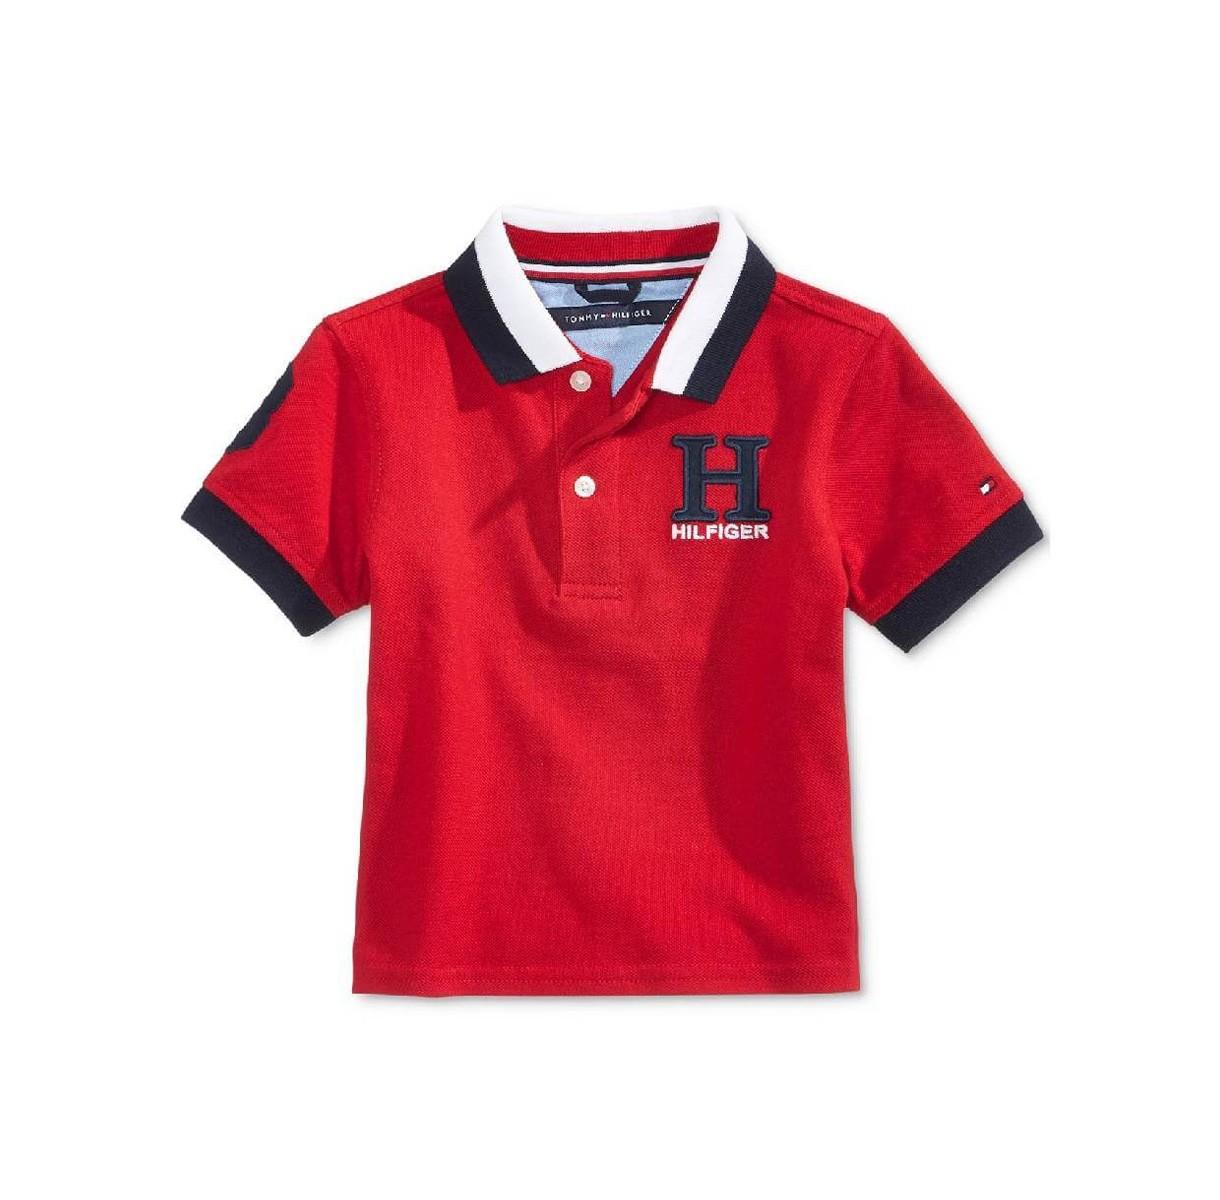 Camiseta Gola Polo Tommy Hilfiger - Tamanho 18 Meses